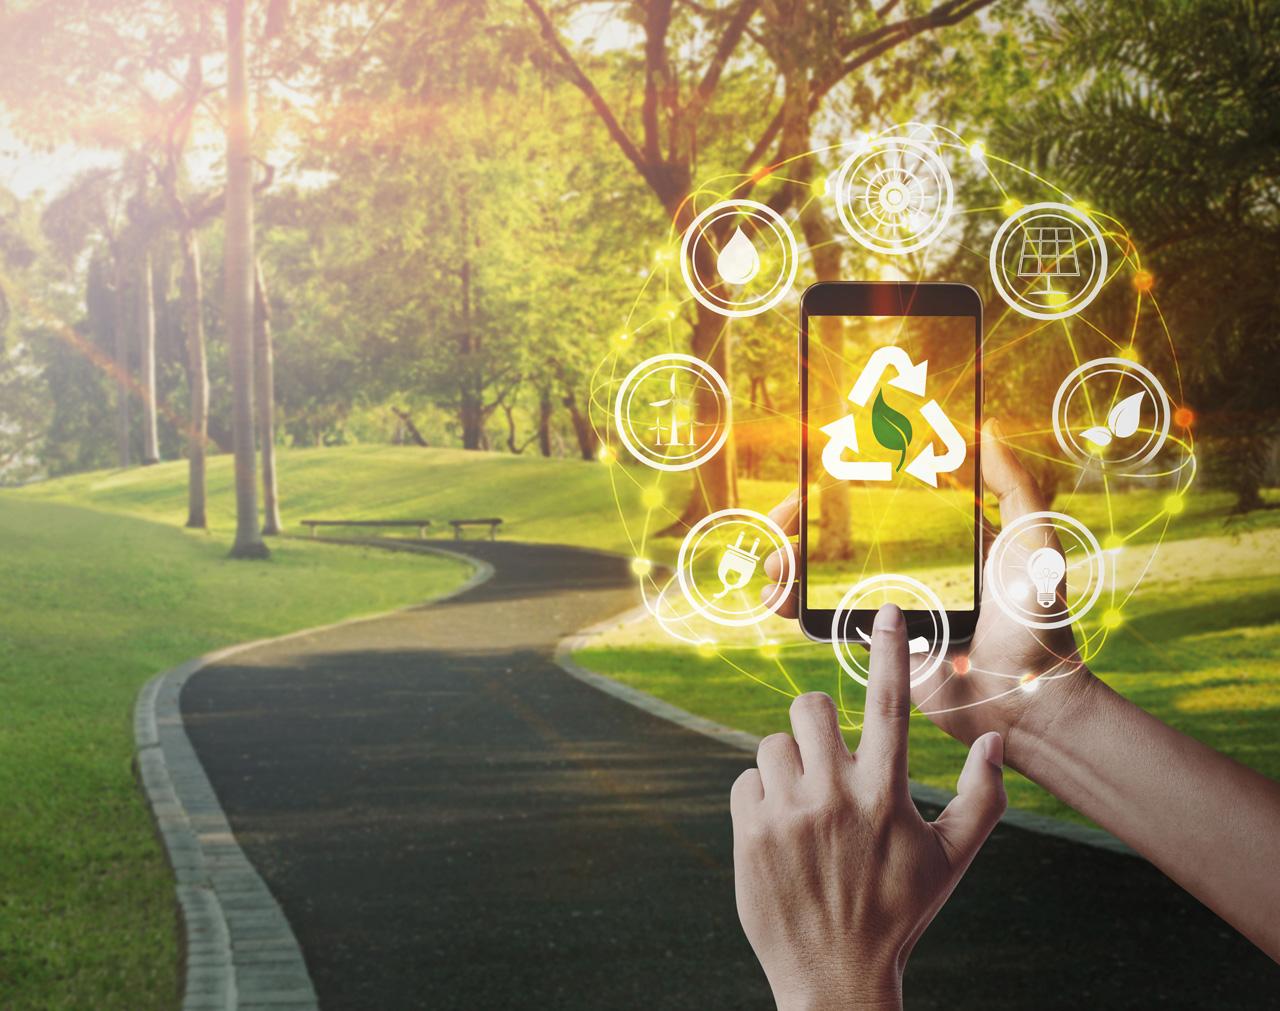 E3 - EBNER Energie Effizienz